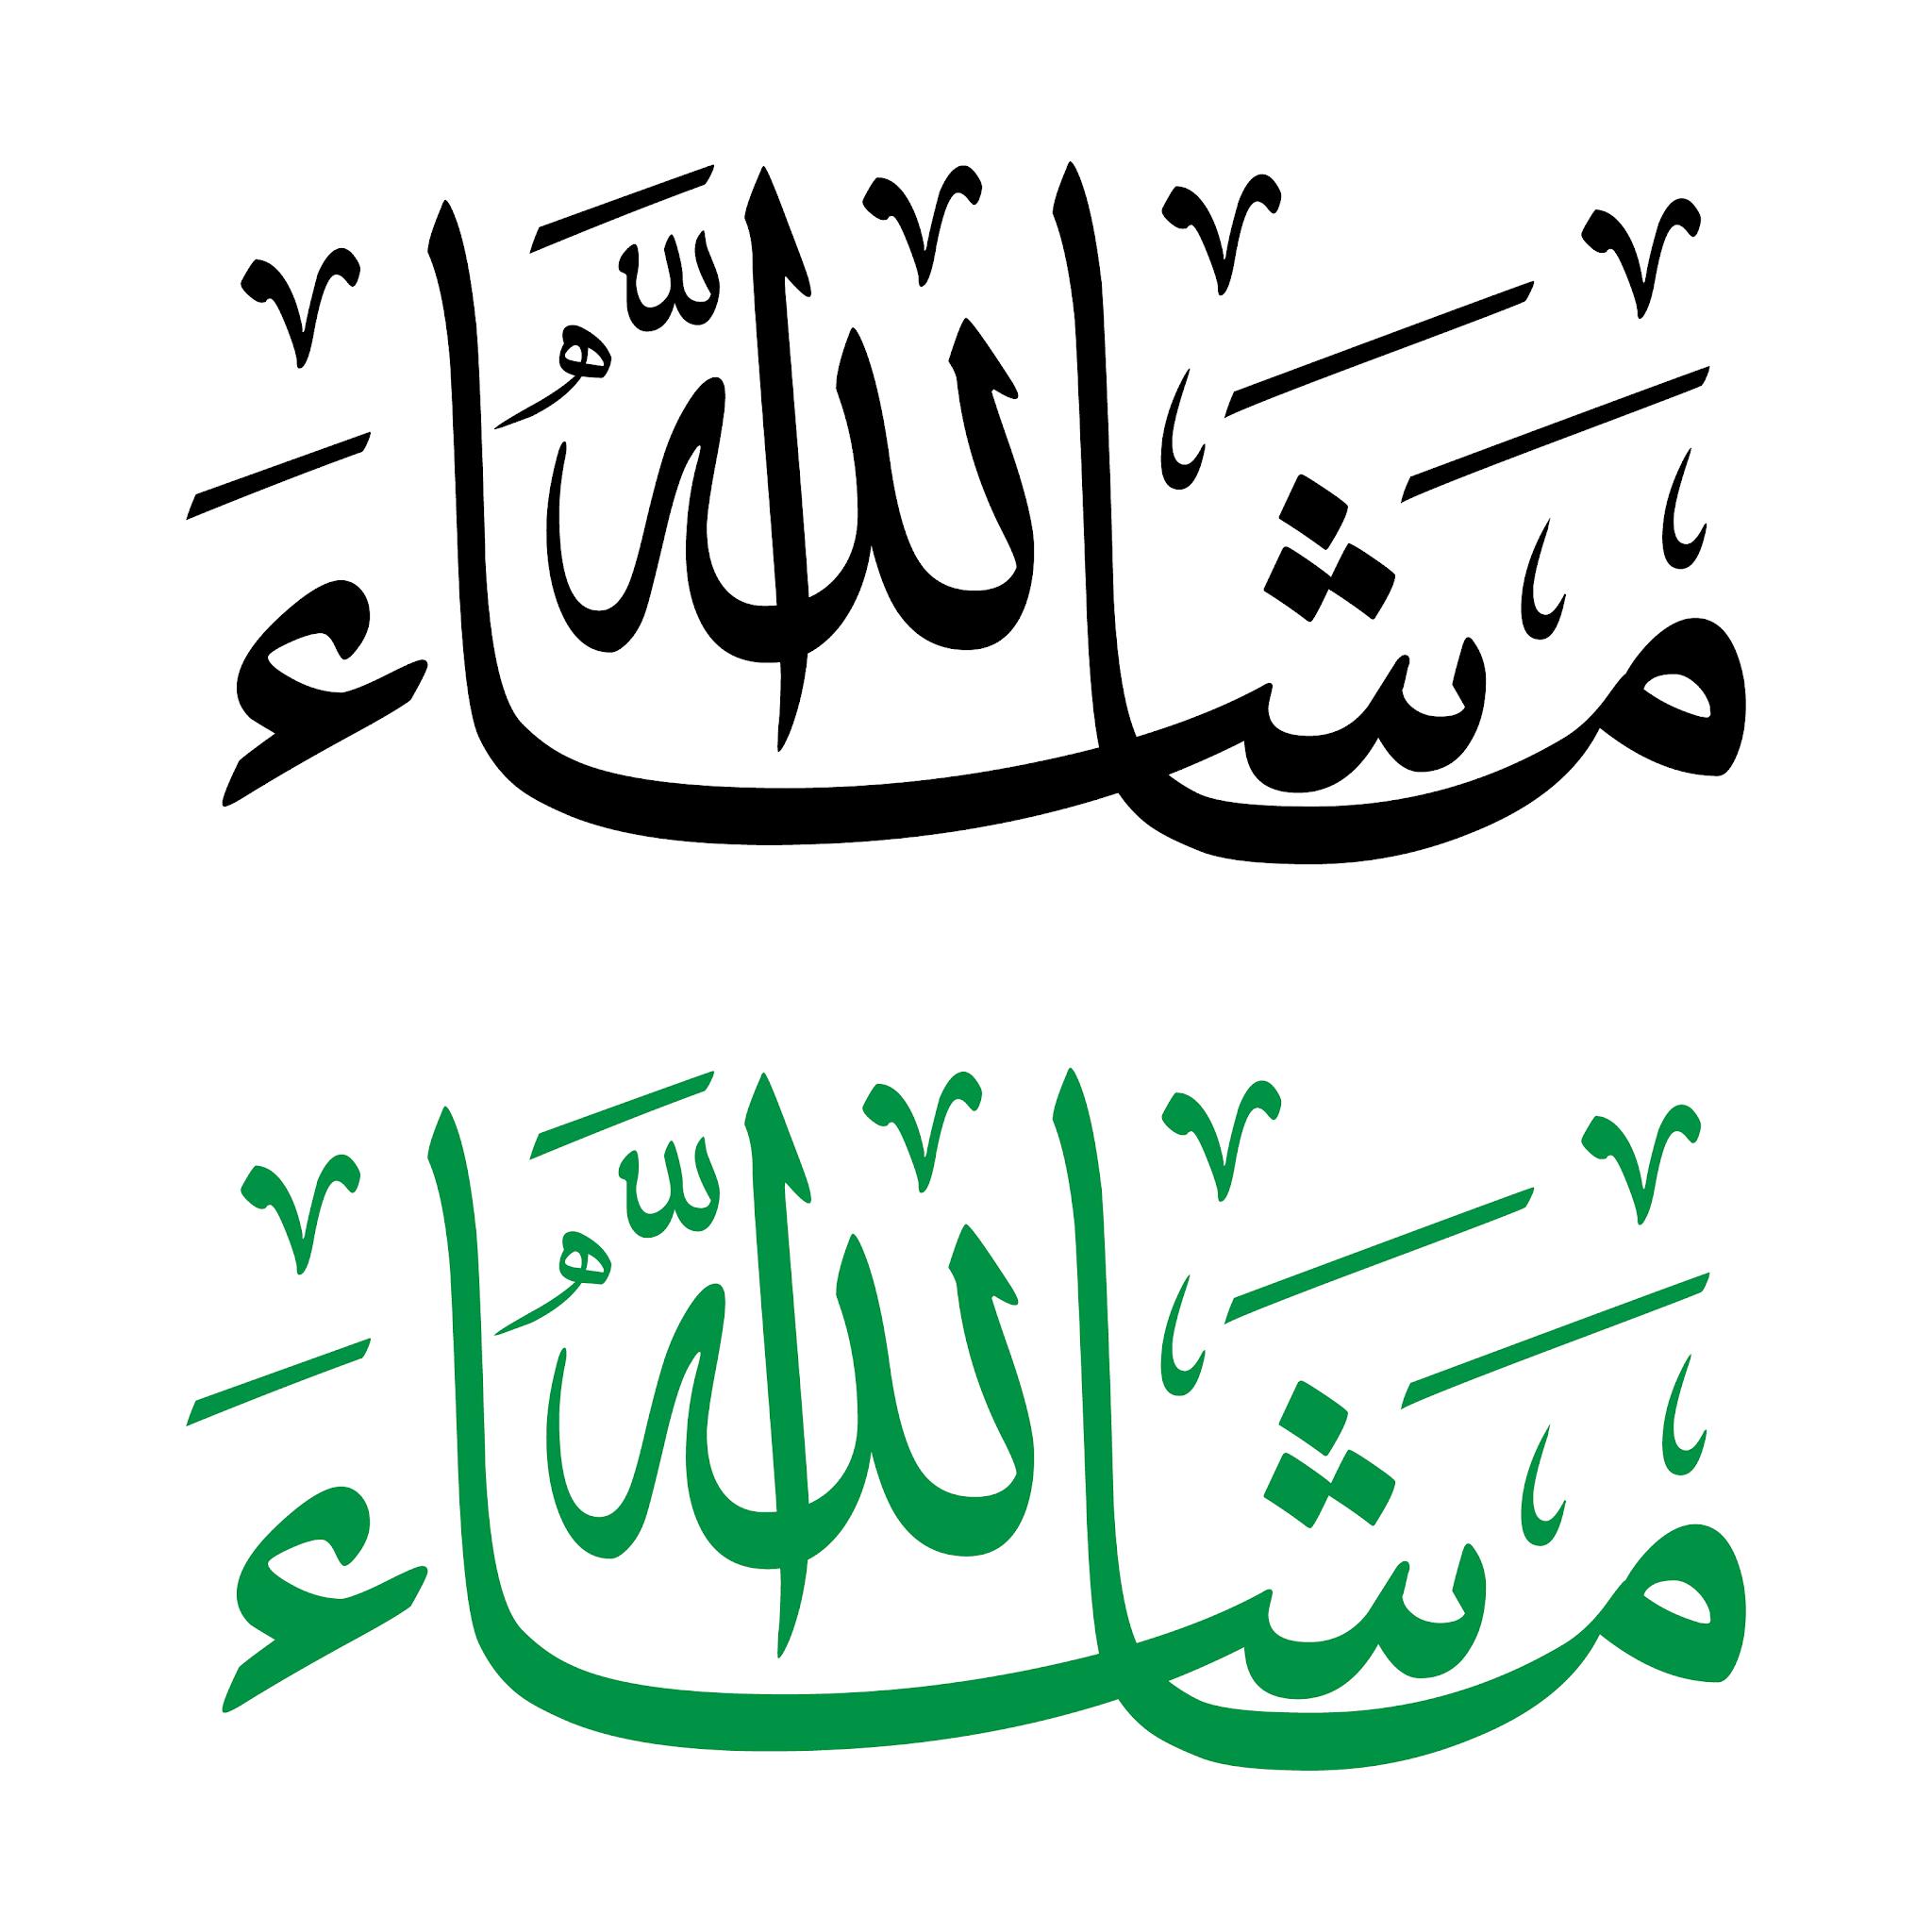 masha allah islamic svg eps psd ai pdf png vector download free #islamic #islam #arab #arabic #vector #vectors #Quran #design #fonts #font #ramadan #hijri #year